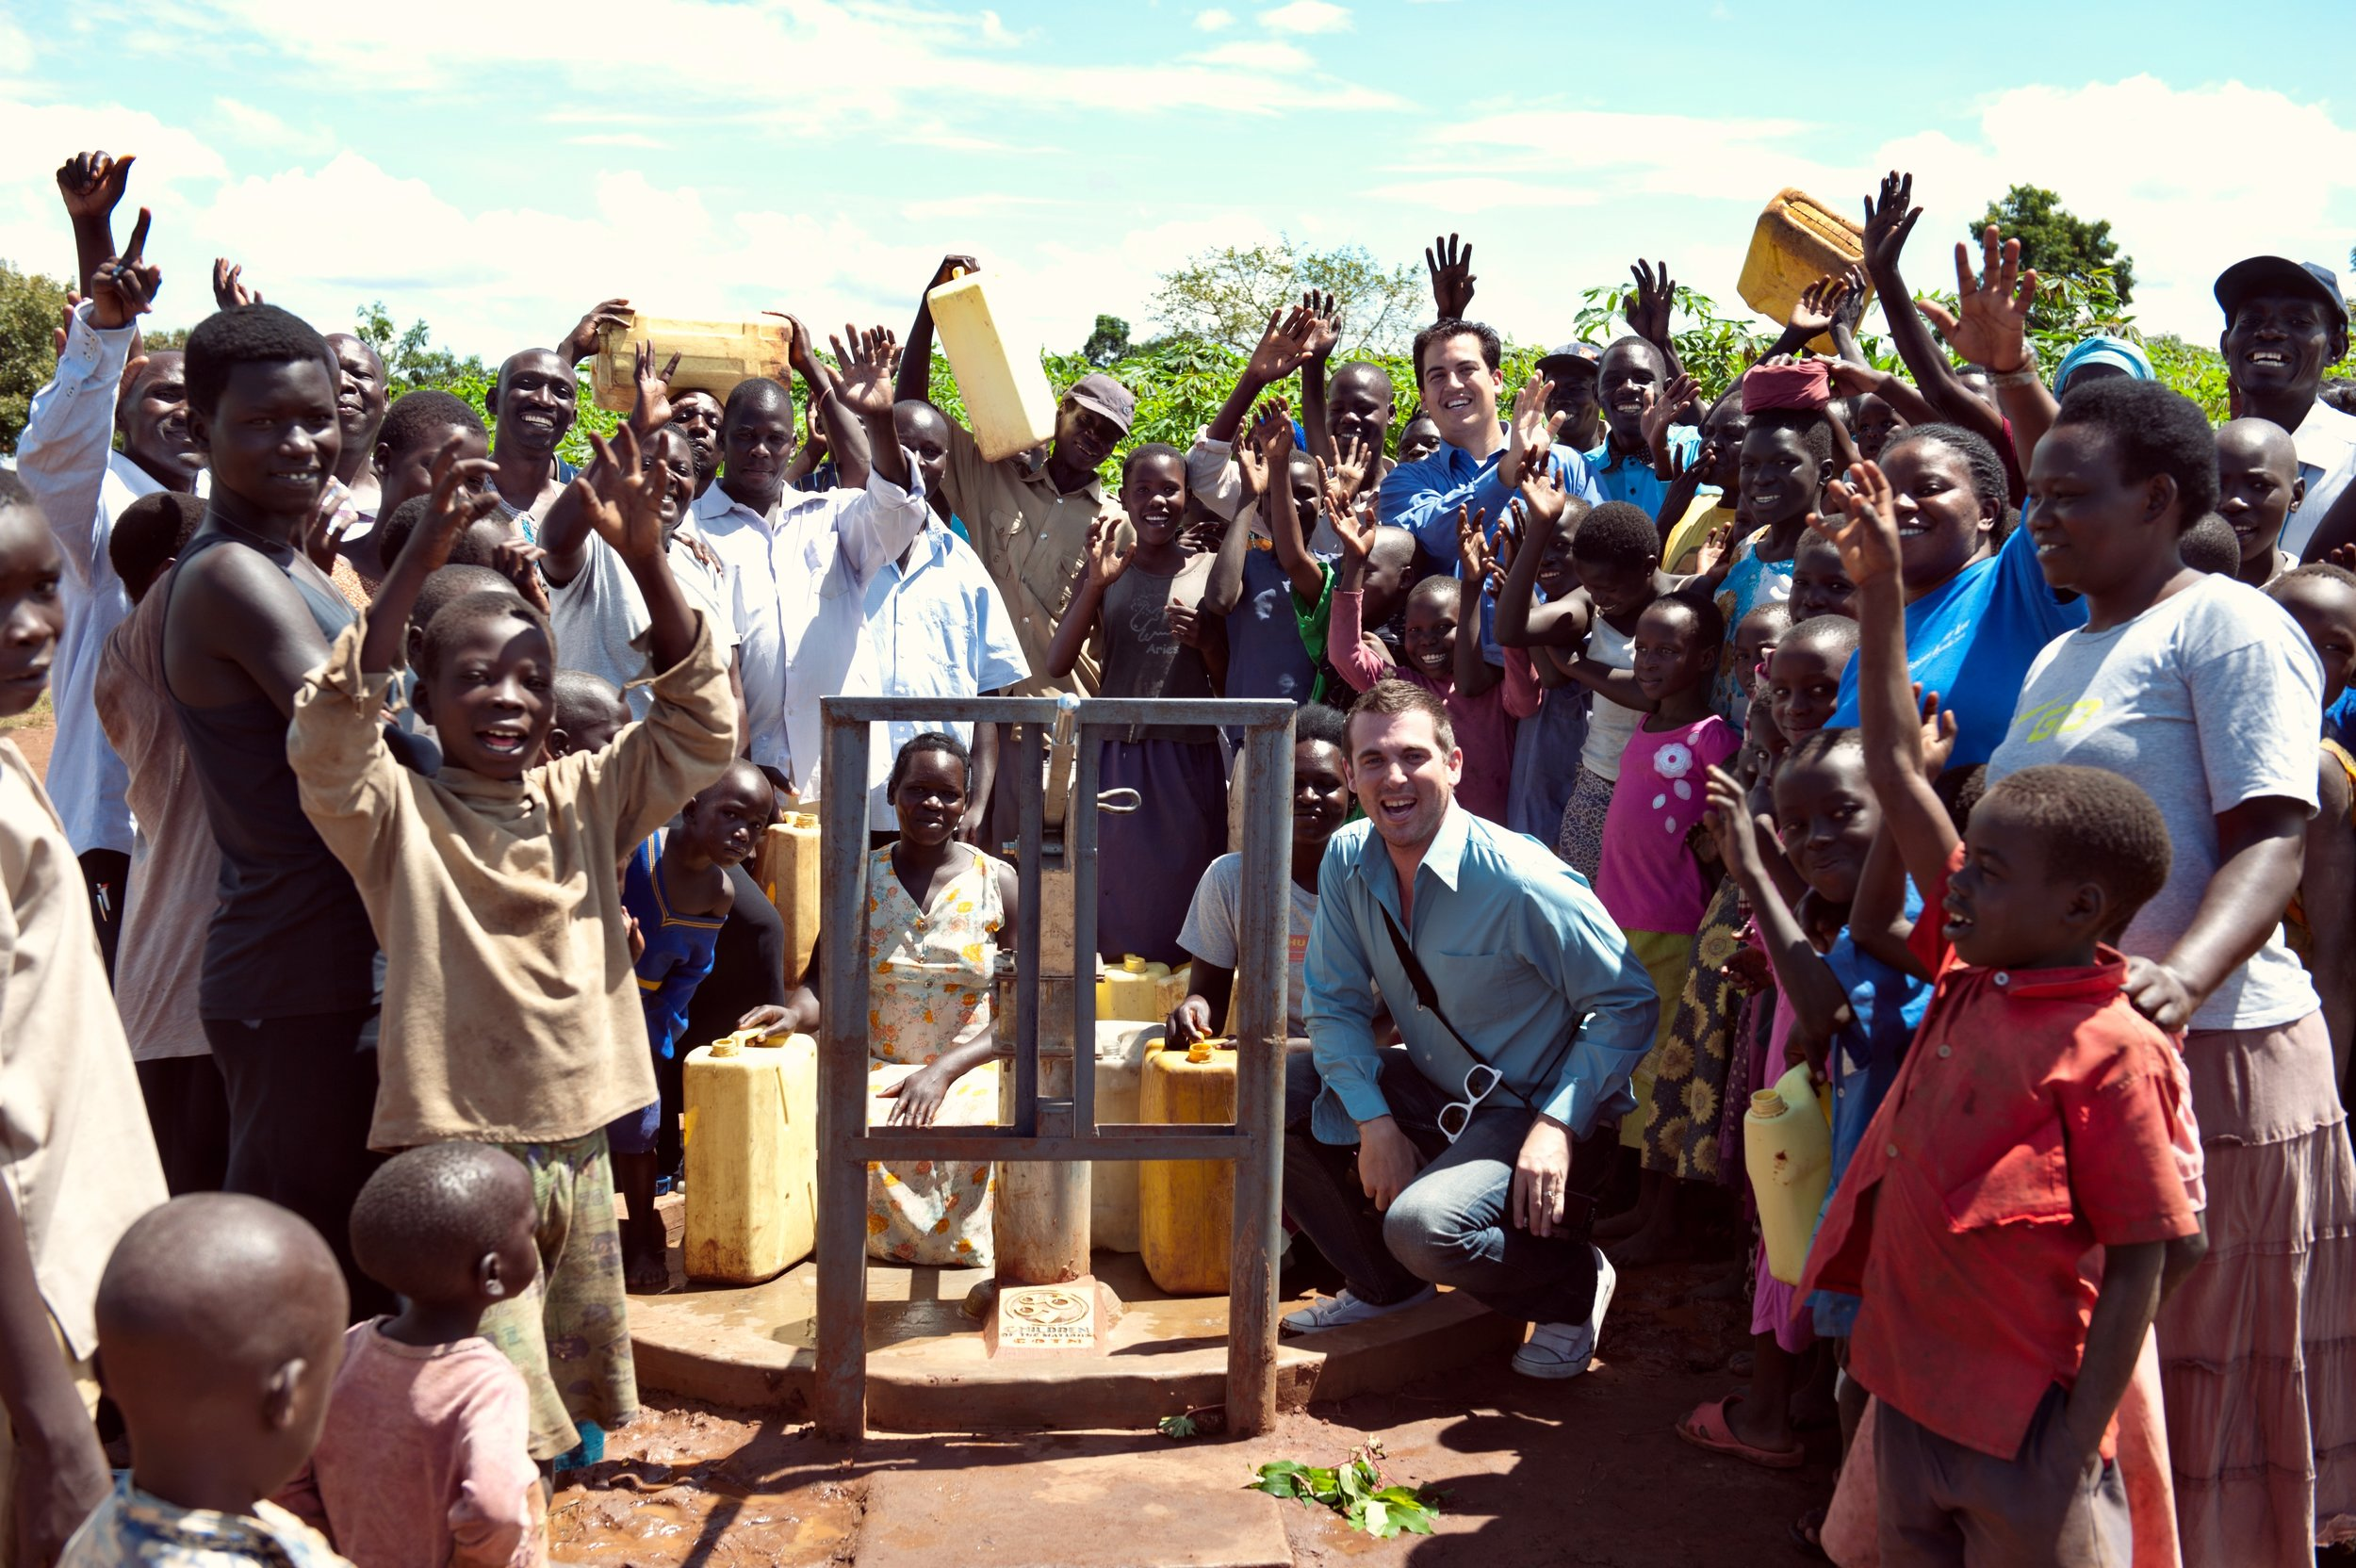 Putting in a fresh water well in Uganda in 2011